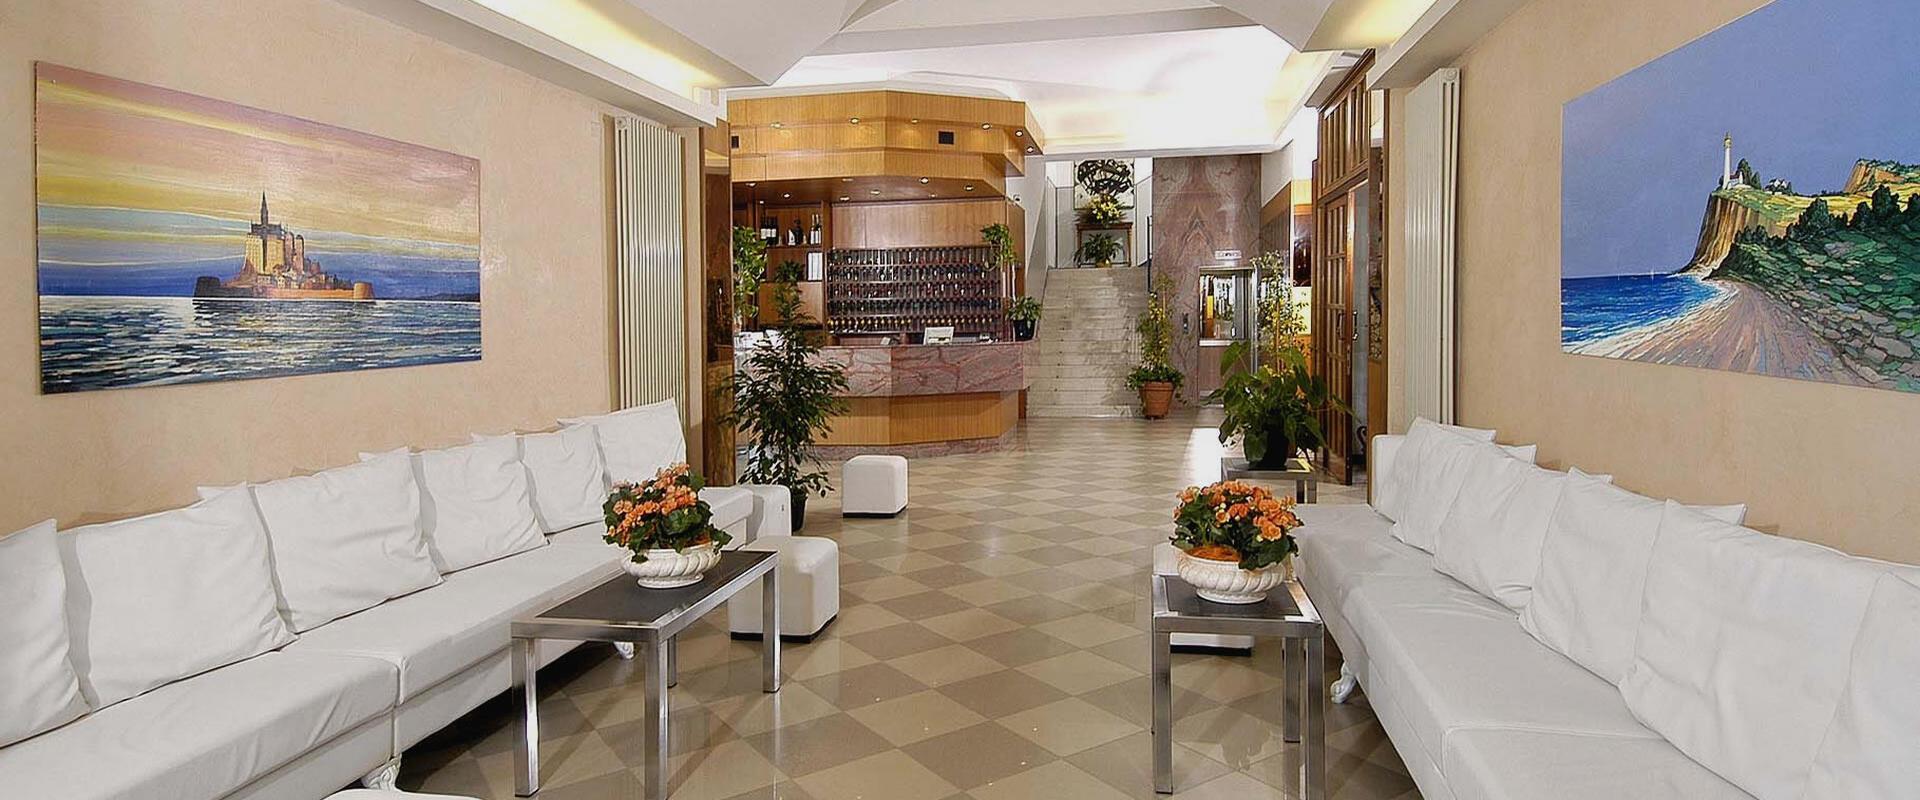 lungomarehotel fr gallery 003